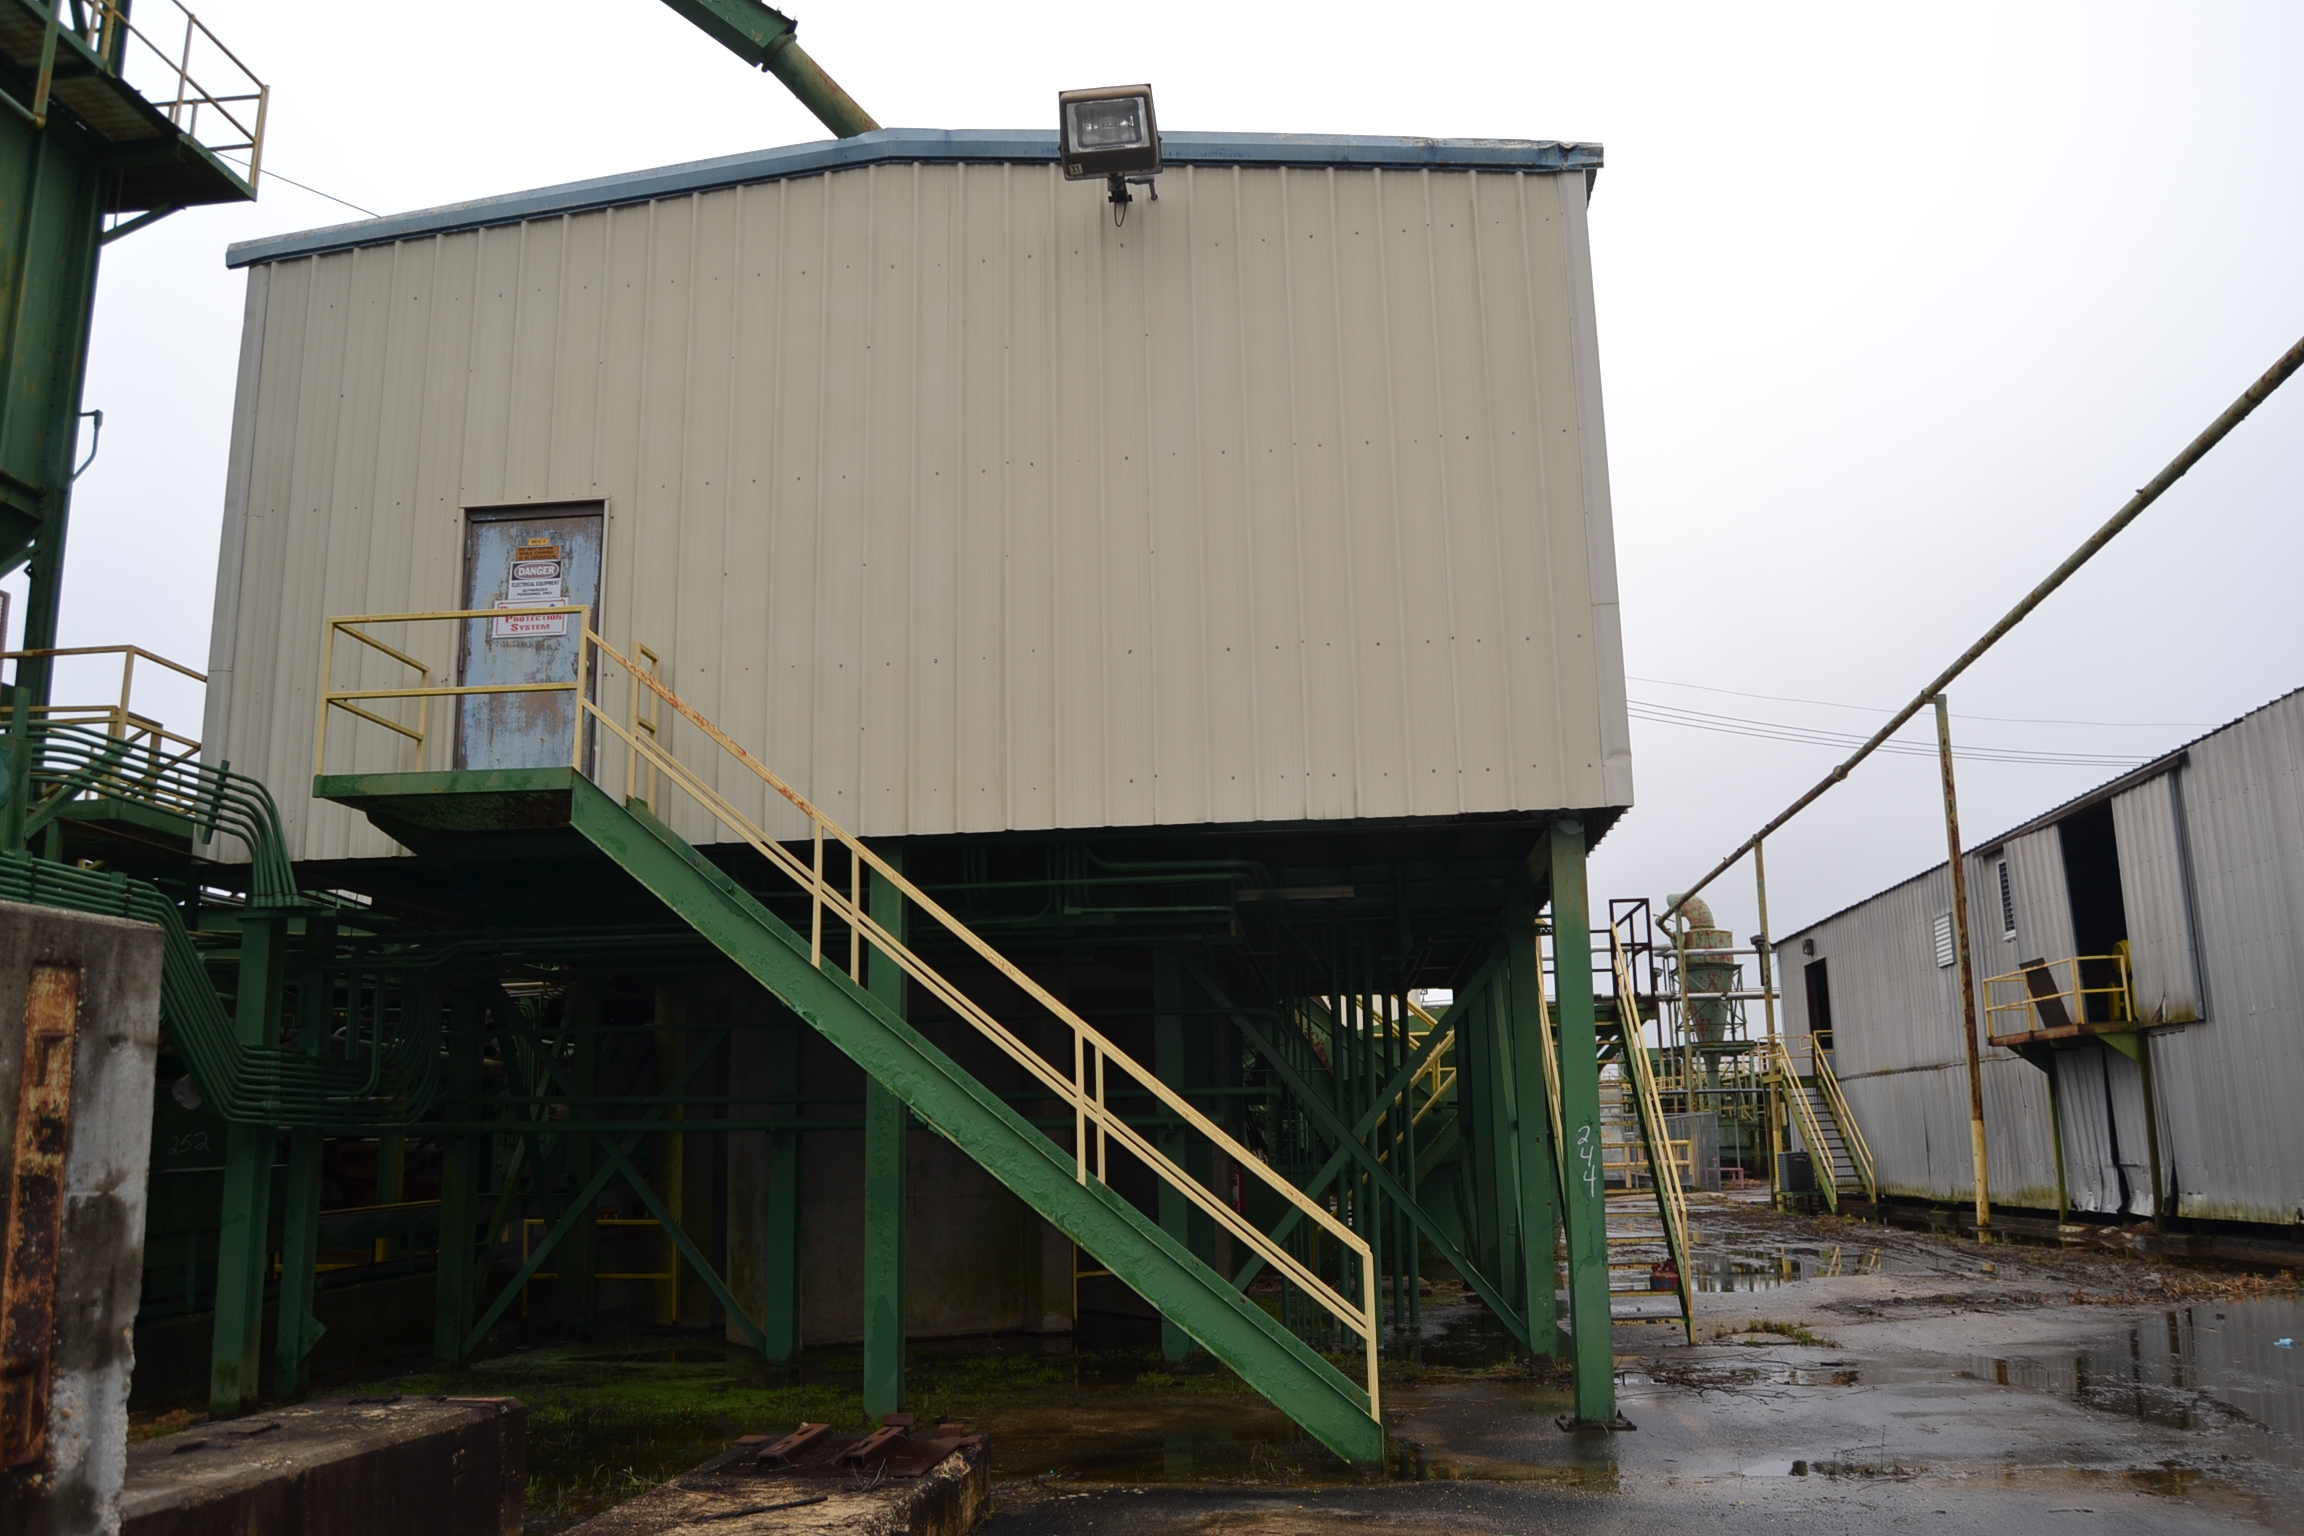 Lot 244 - 30' X 40' PREFAB CHIPPER BUILDING